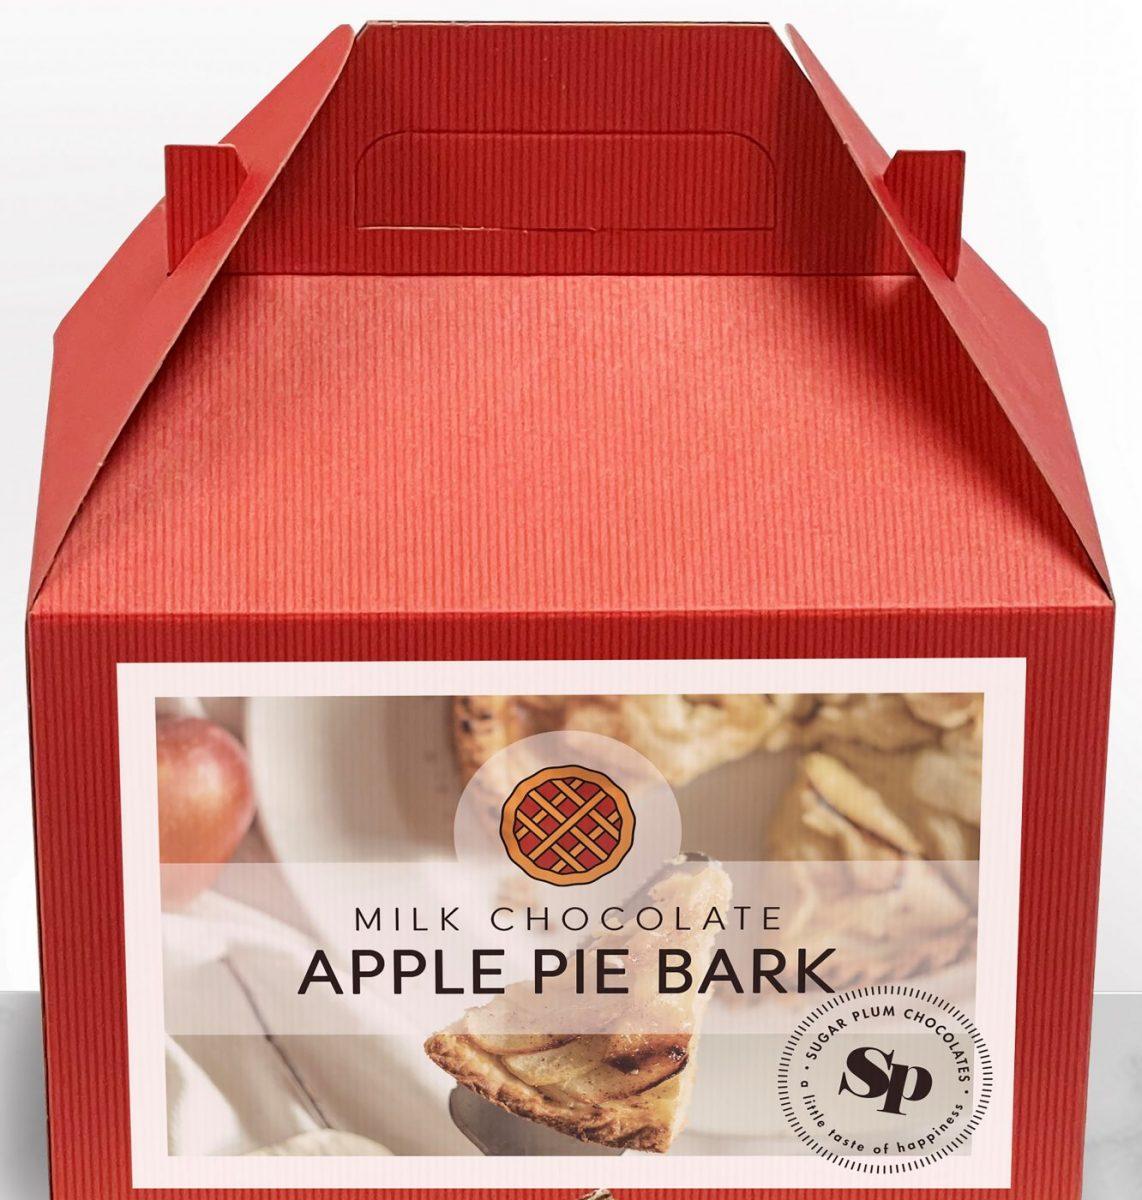 Milk Chocolate Apple Pie Bark